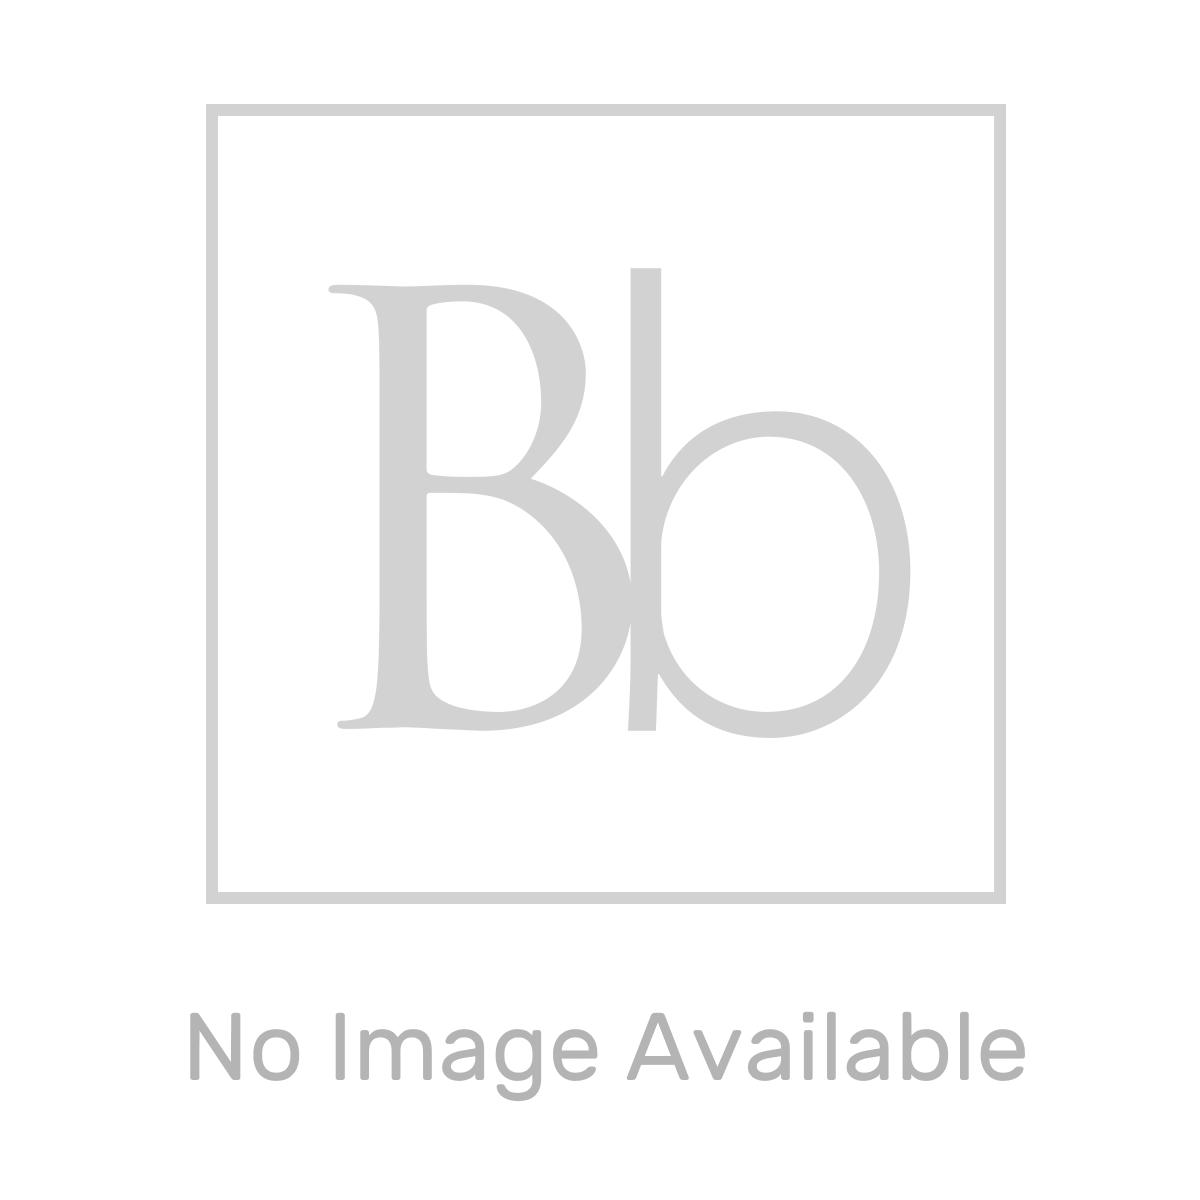 Nuie Athena Hacienda Black 2 Drawer Floor Standing Vanity Unit with 40mm Profile Basin 800mm Line Drawing